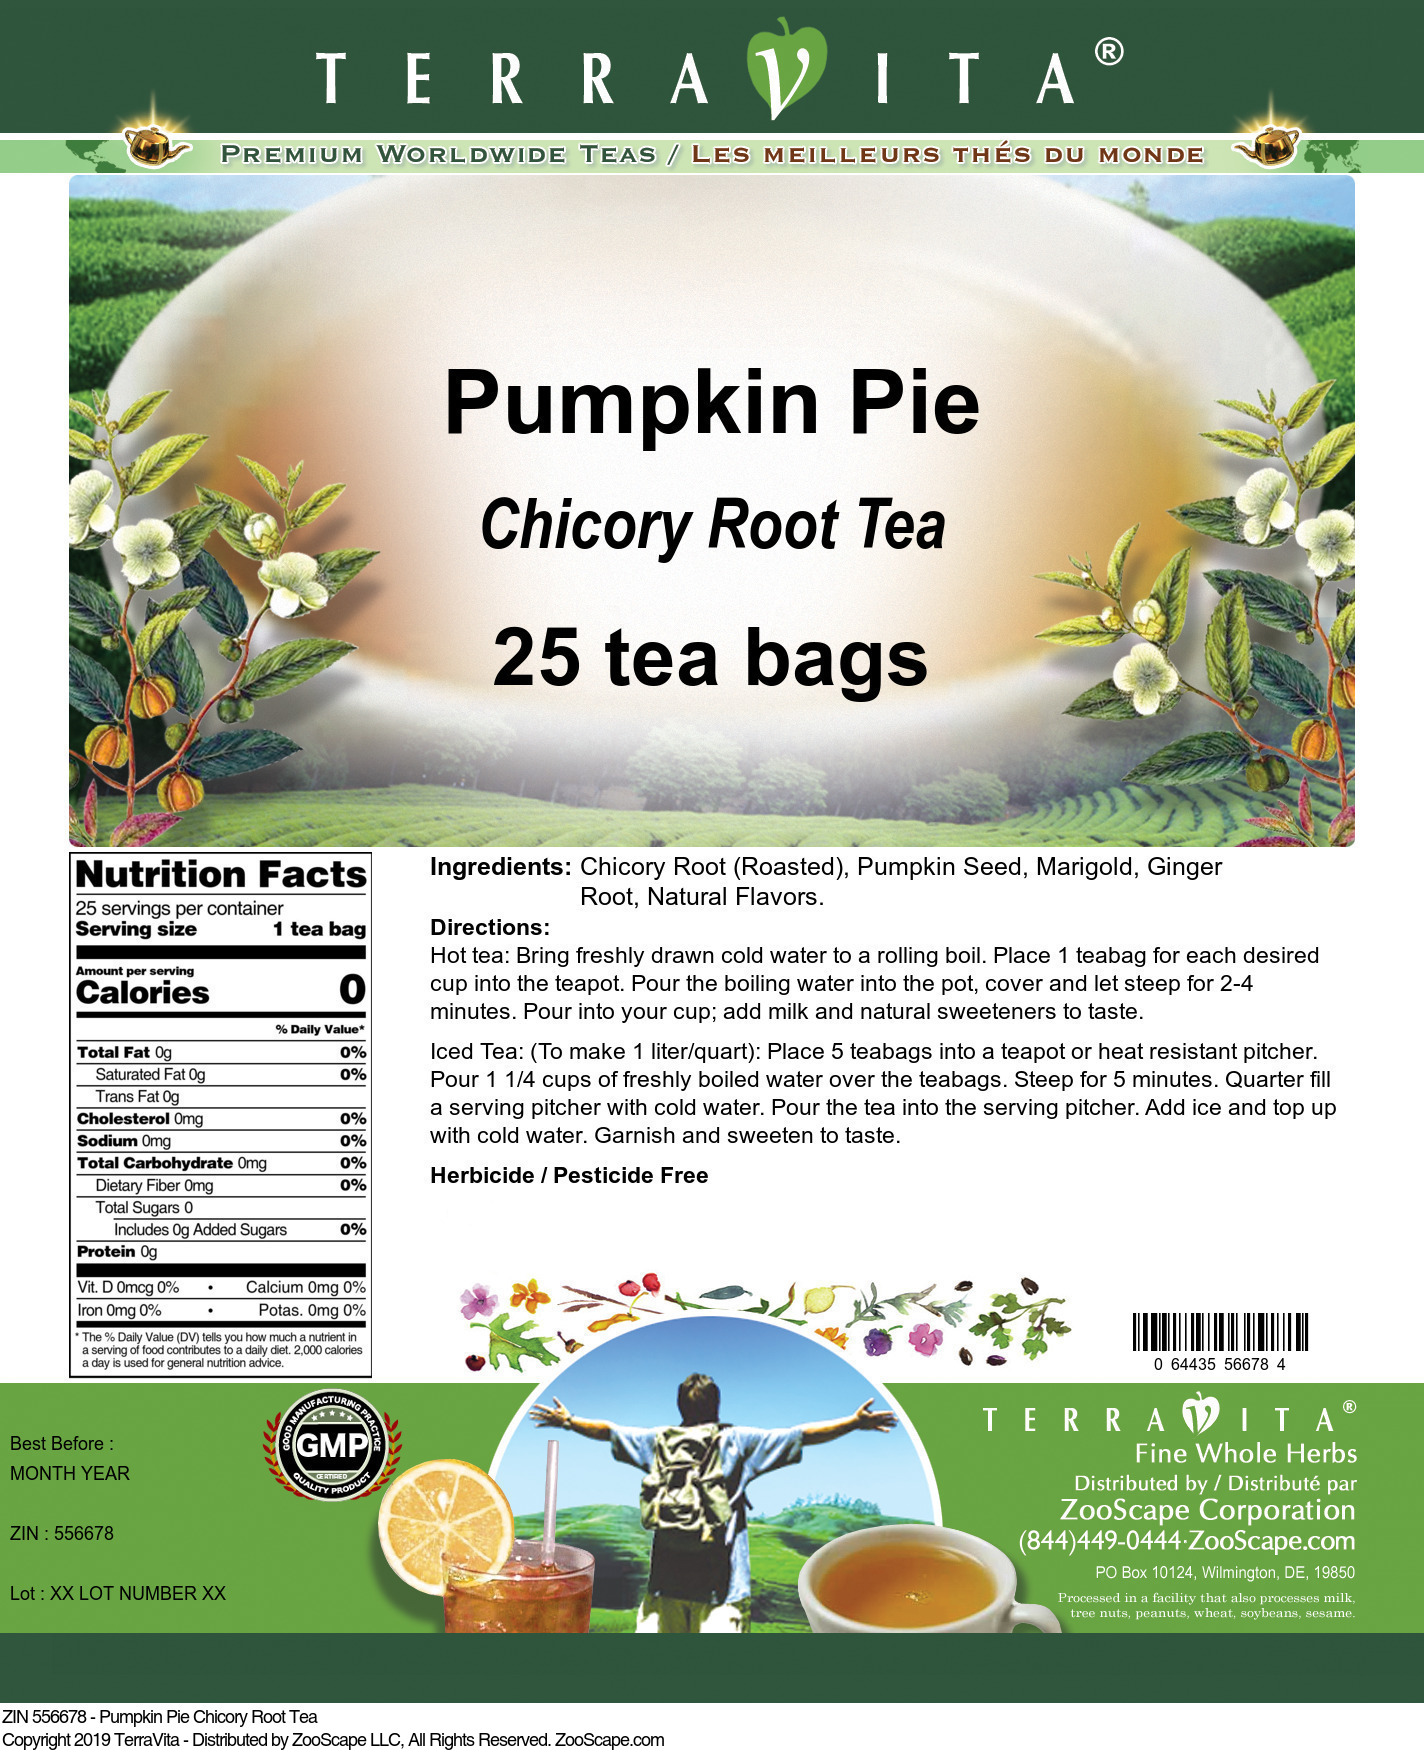 Pumpkin Pie Chicory Root Tea